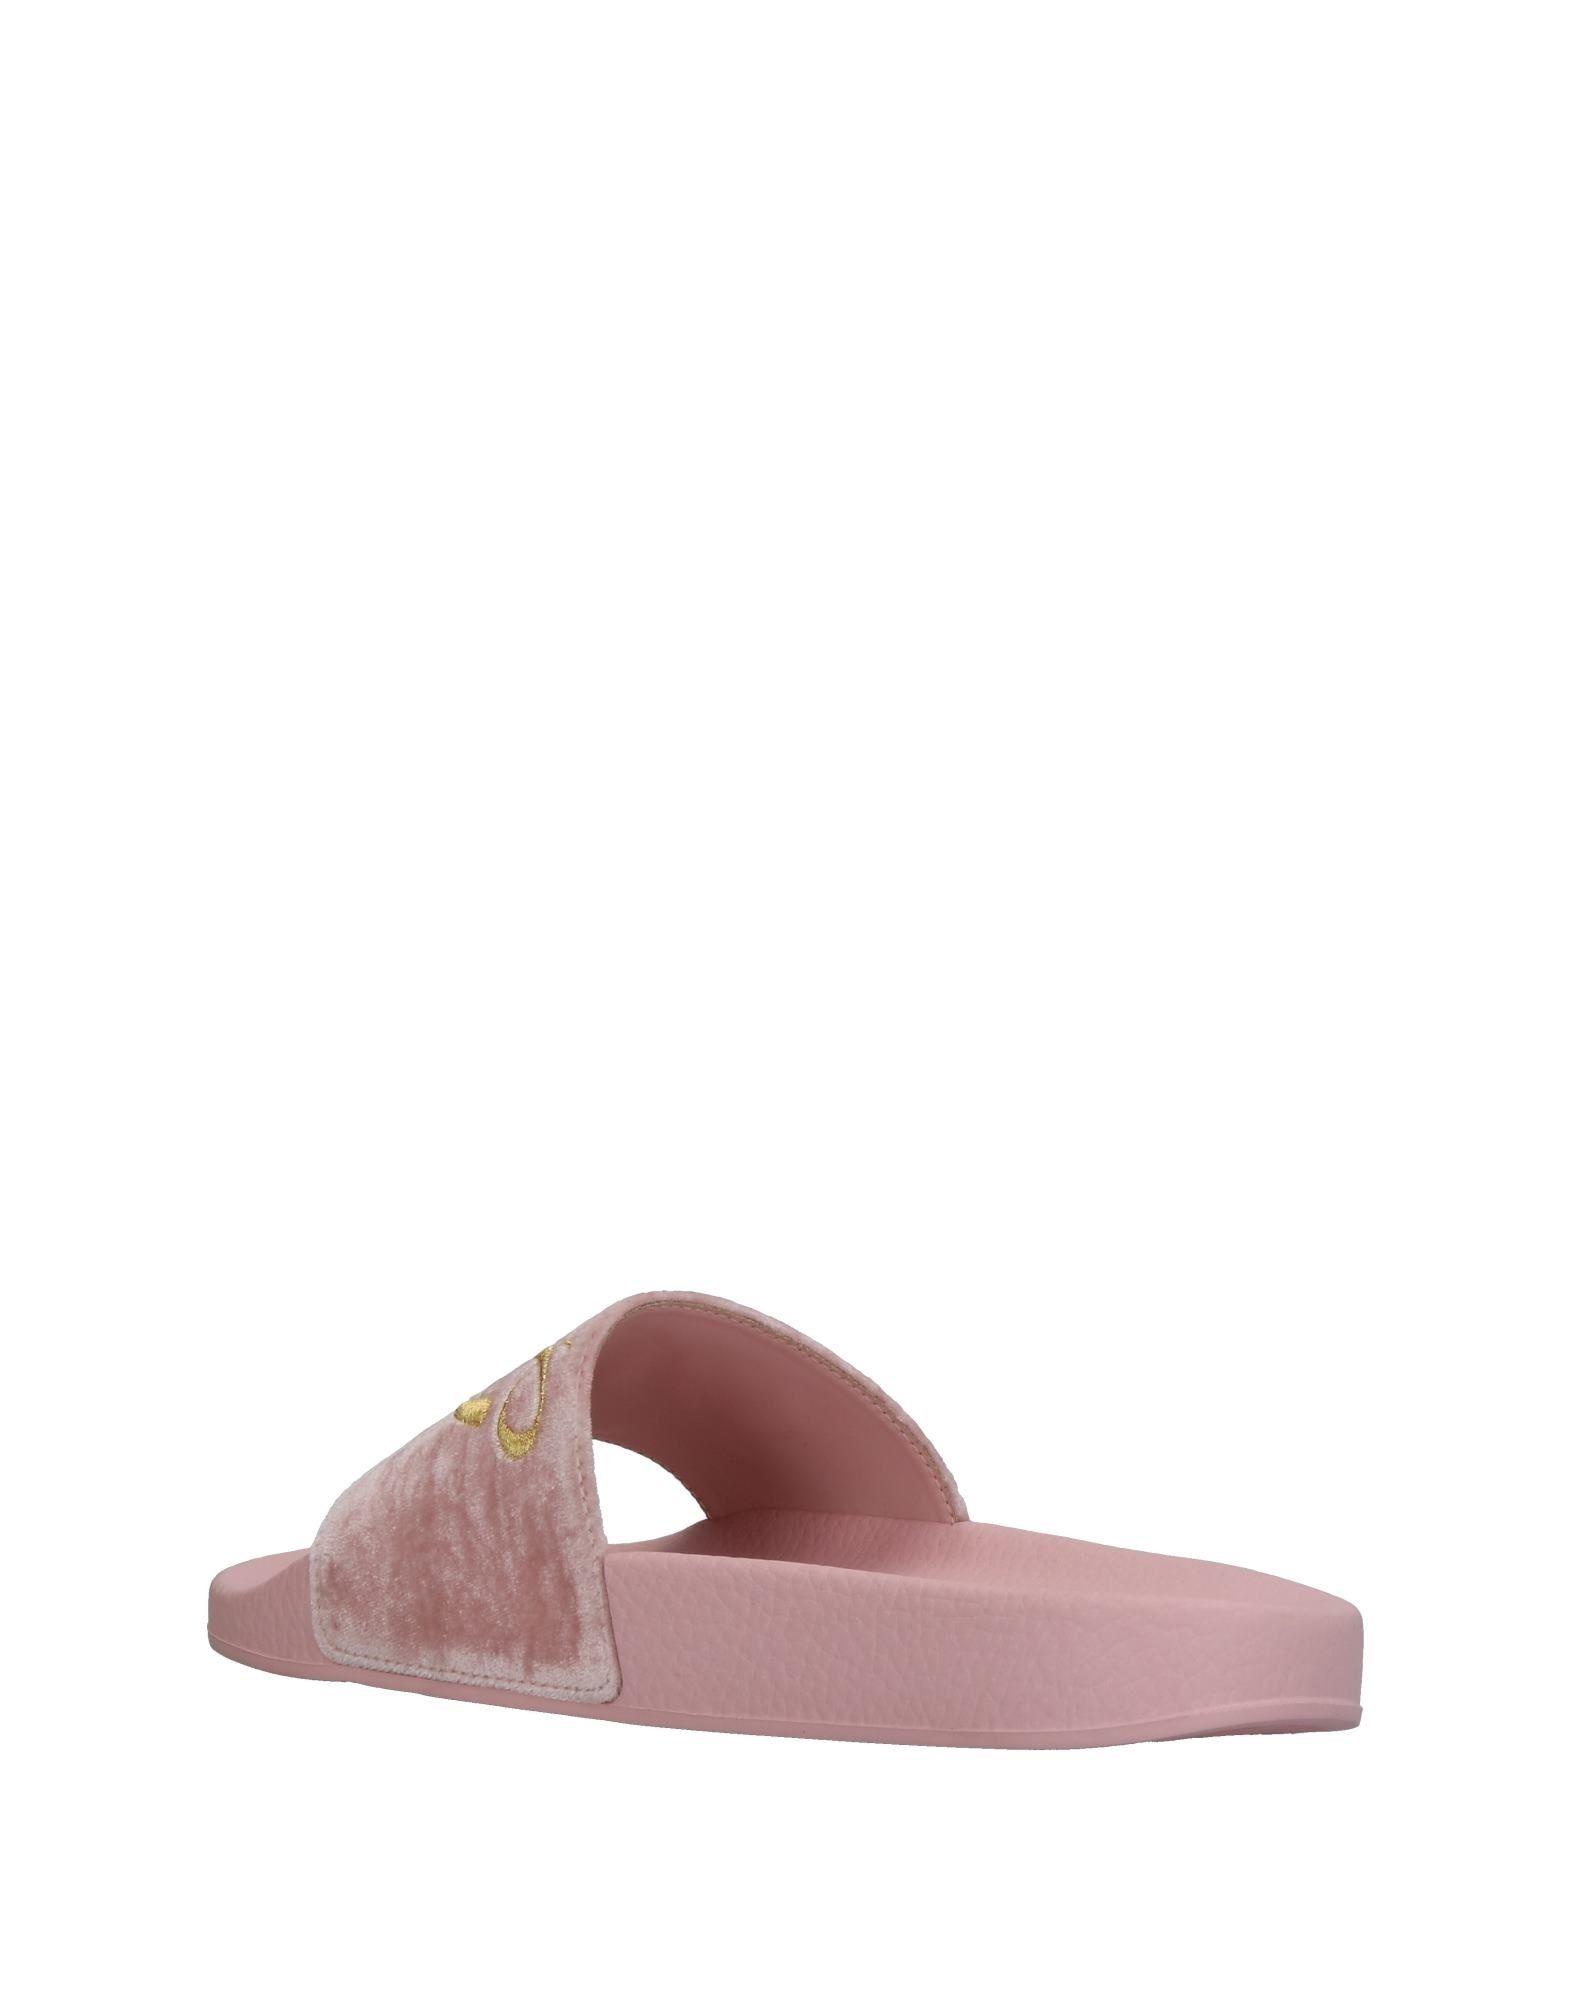 Dolce  & Gabbana Hausschuhe Damen  Dolce 11344830FJ Neue Schuhe 9aaa5e